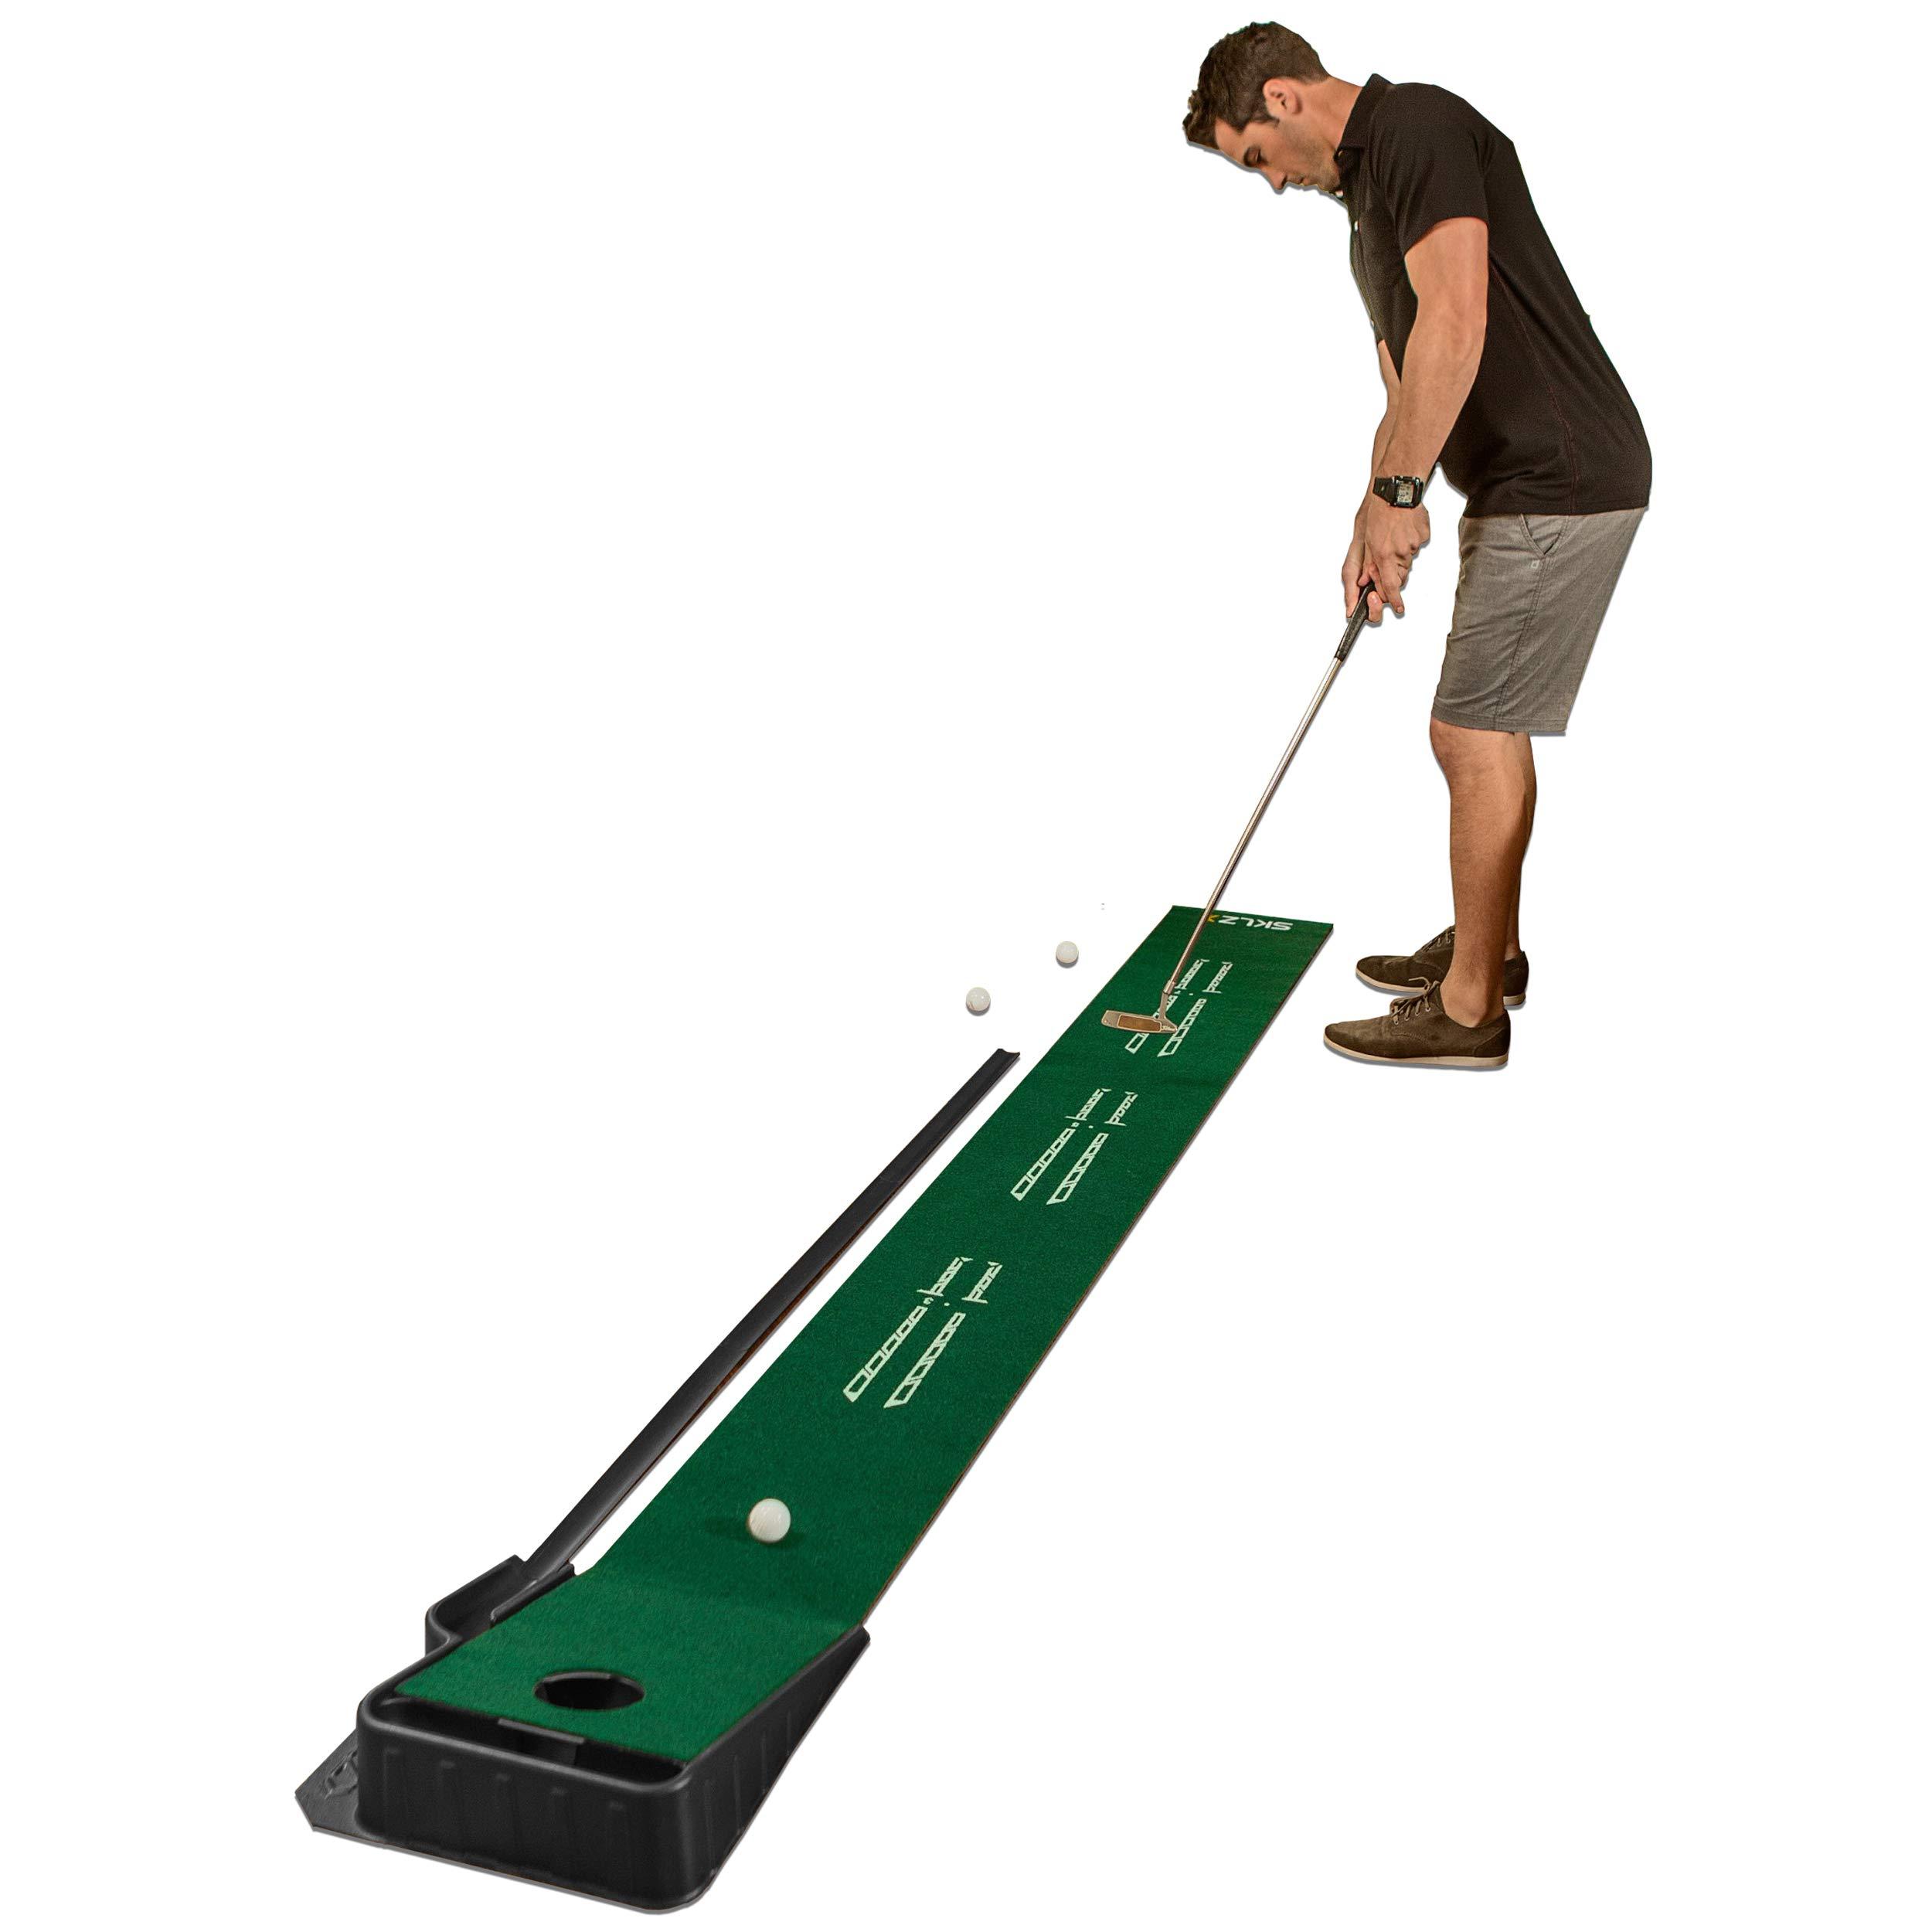 SKLZ Accelerator Pro Indoor Putting